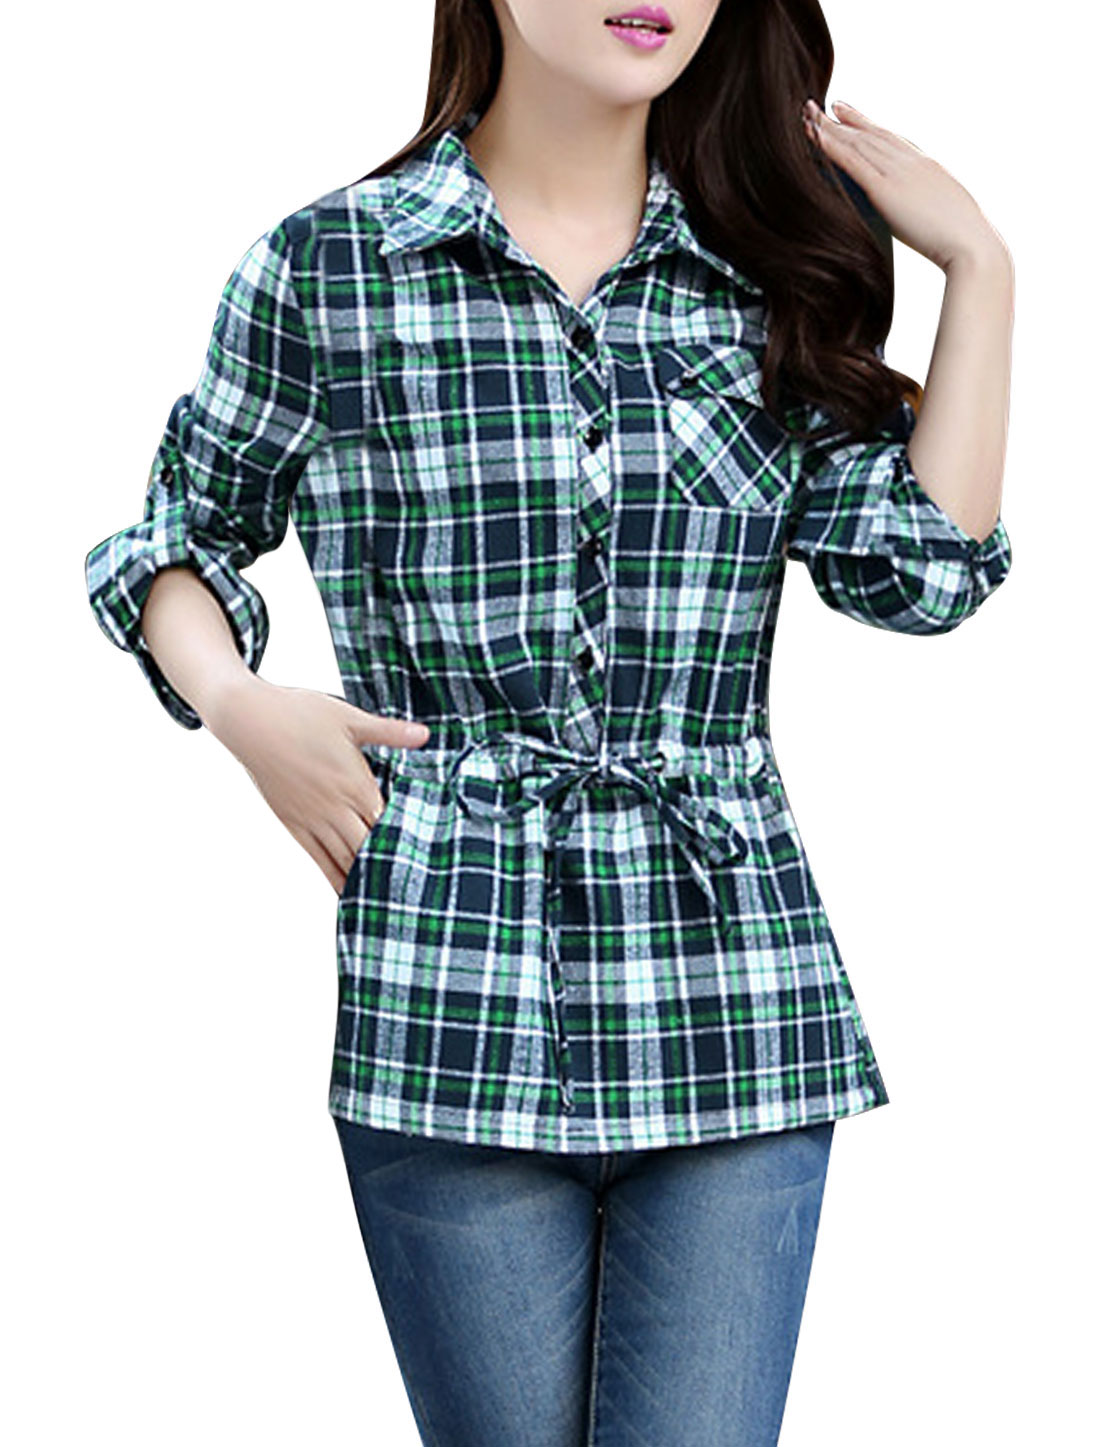 Lady Plaids Pattern Buttoned Cuffs Drawstring Casual Shirt Green Navy Blue L